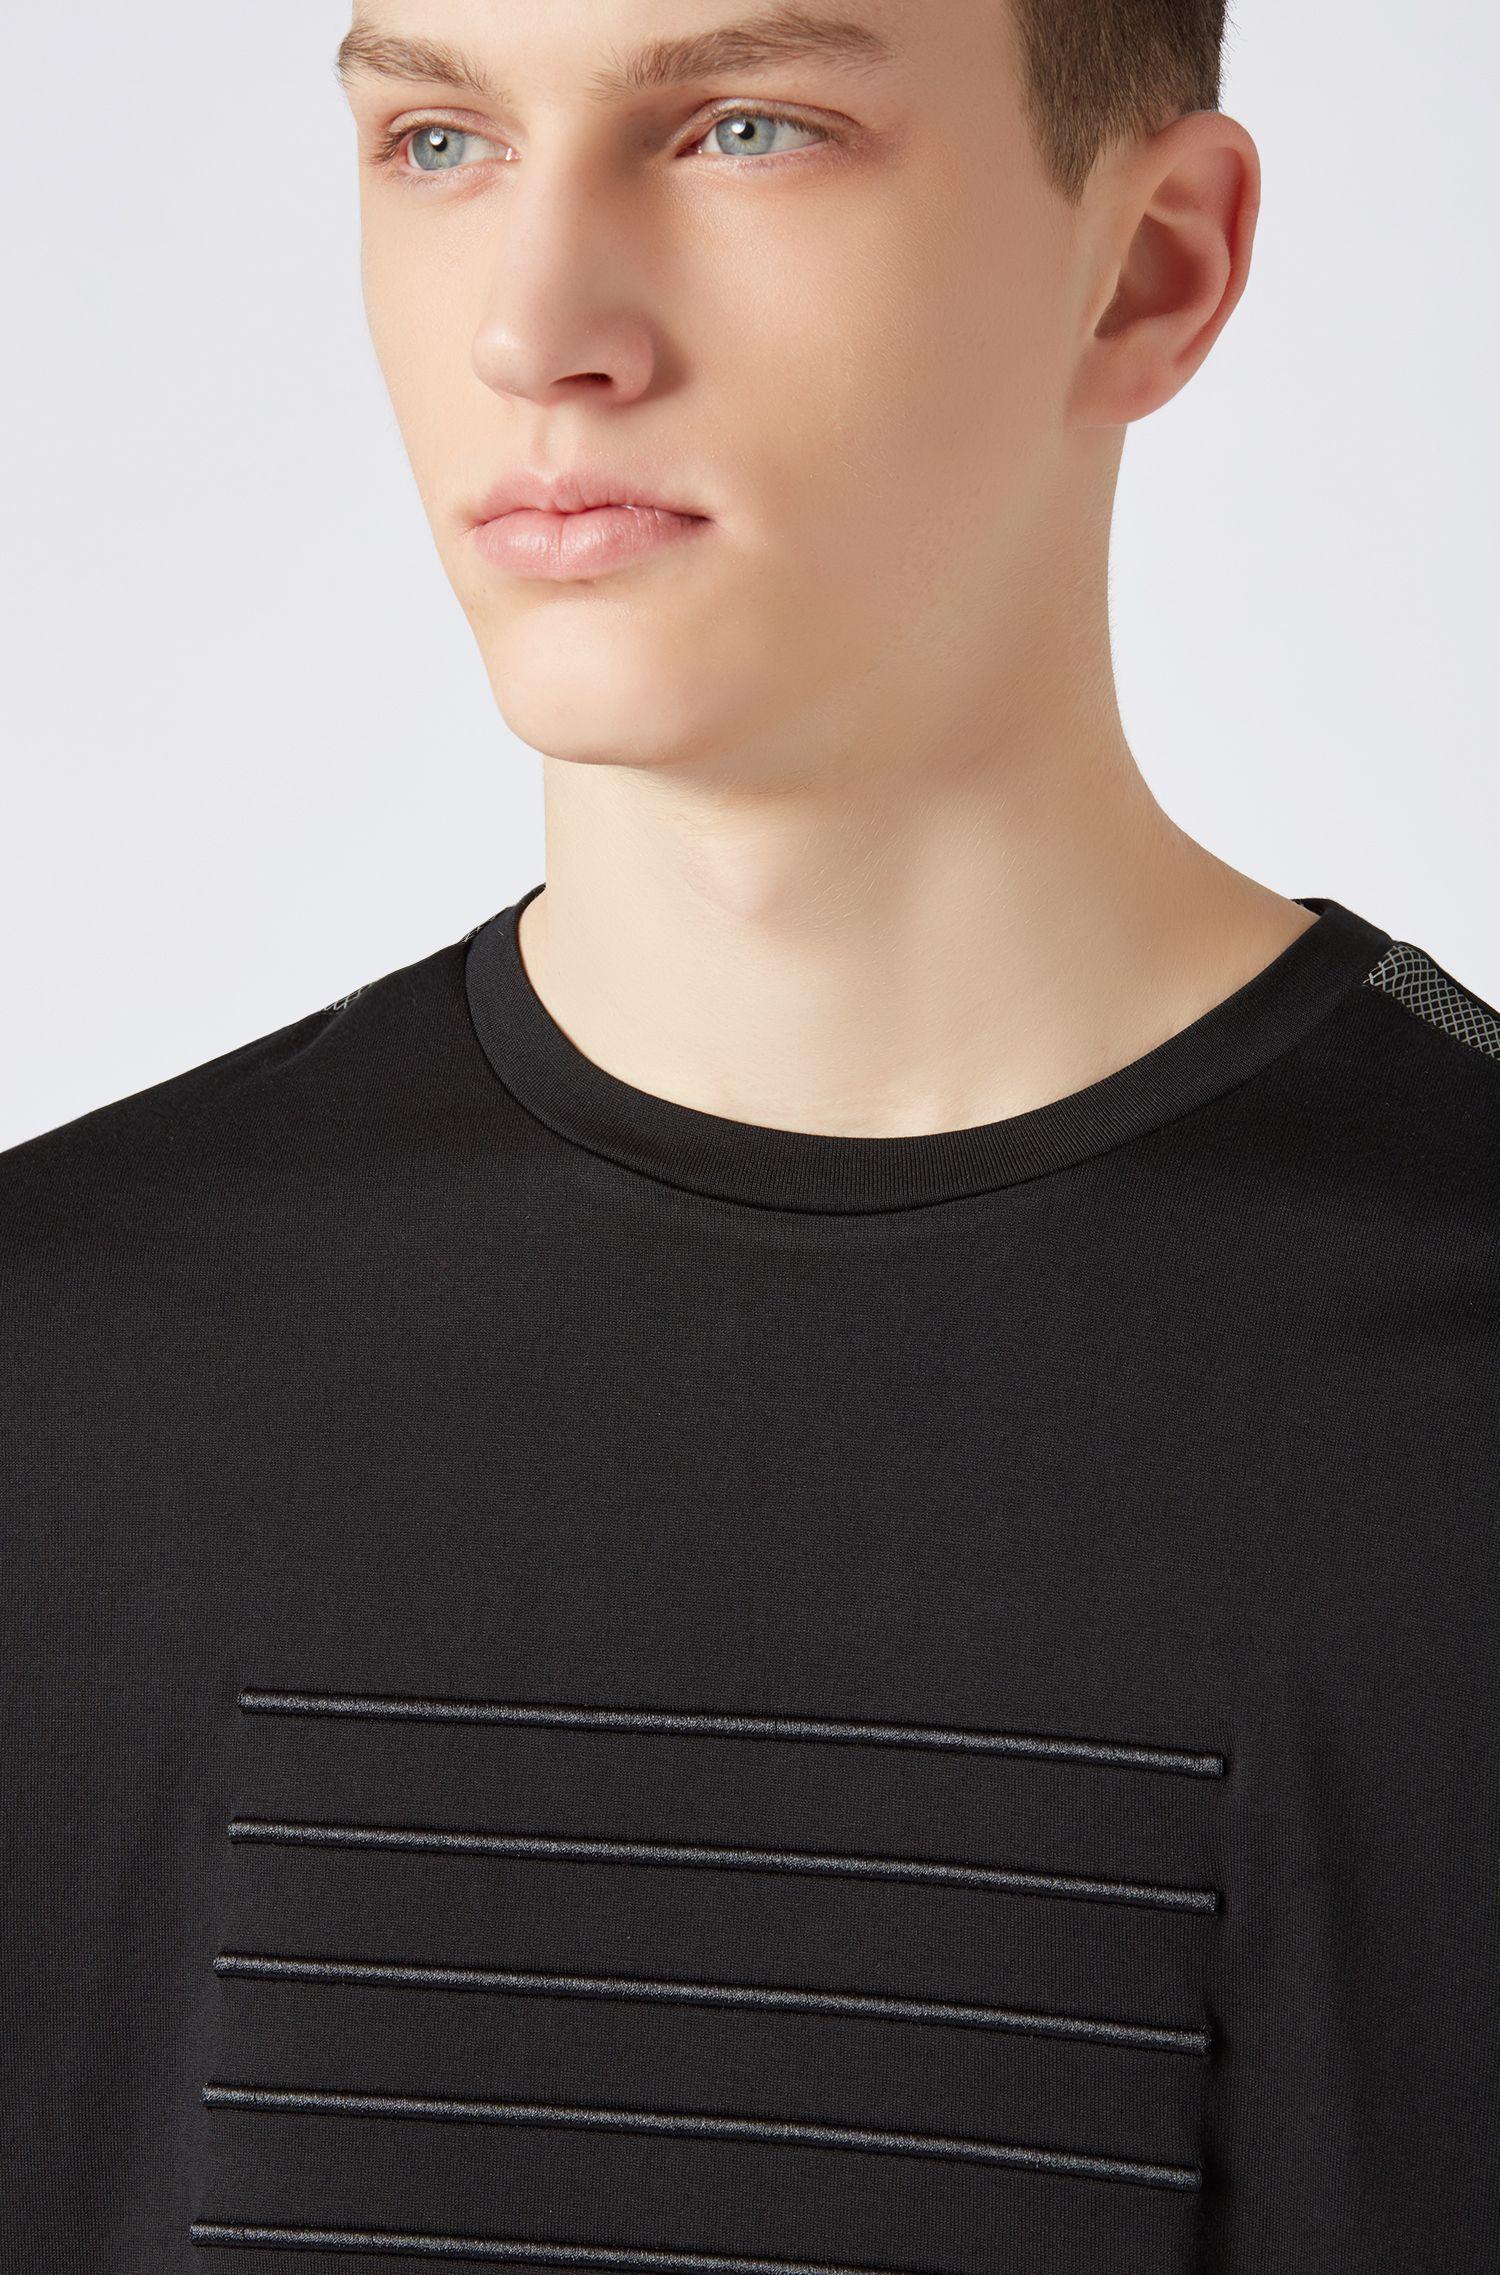 Camiseta relaxed fit con rayas bordadas, Negro